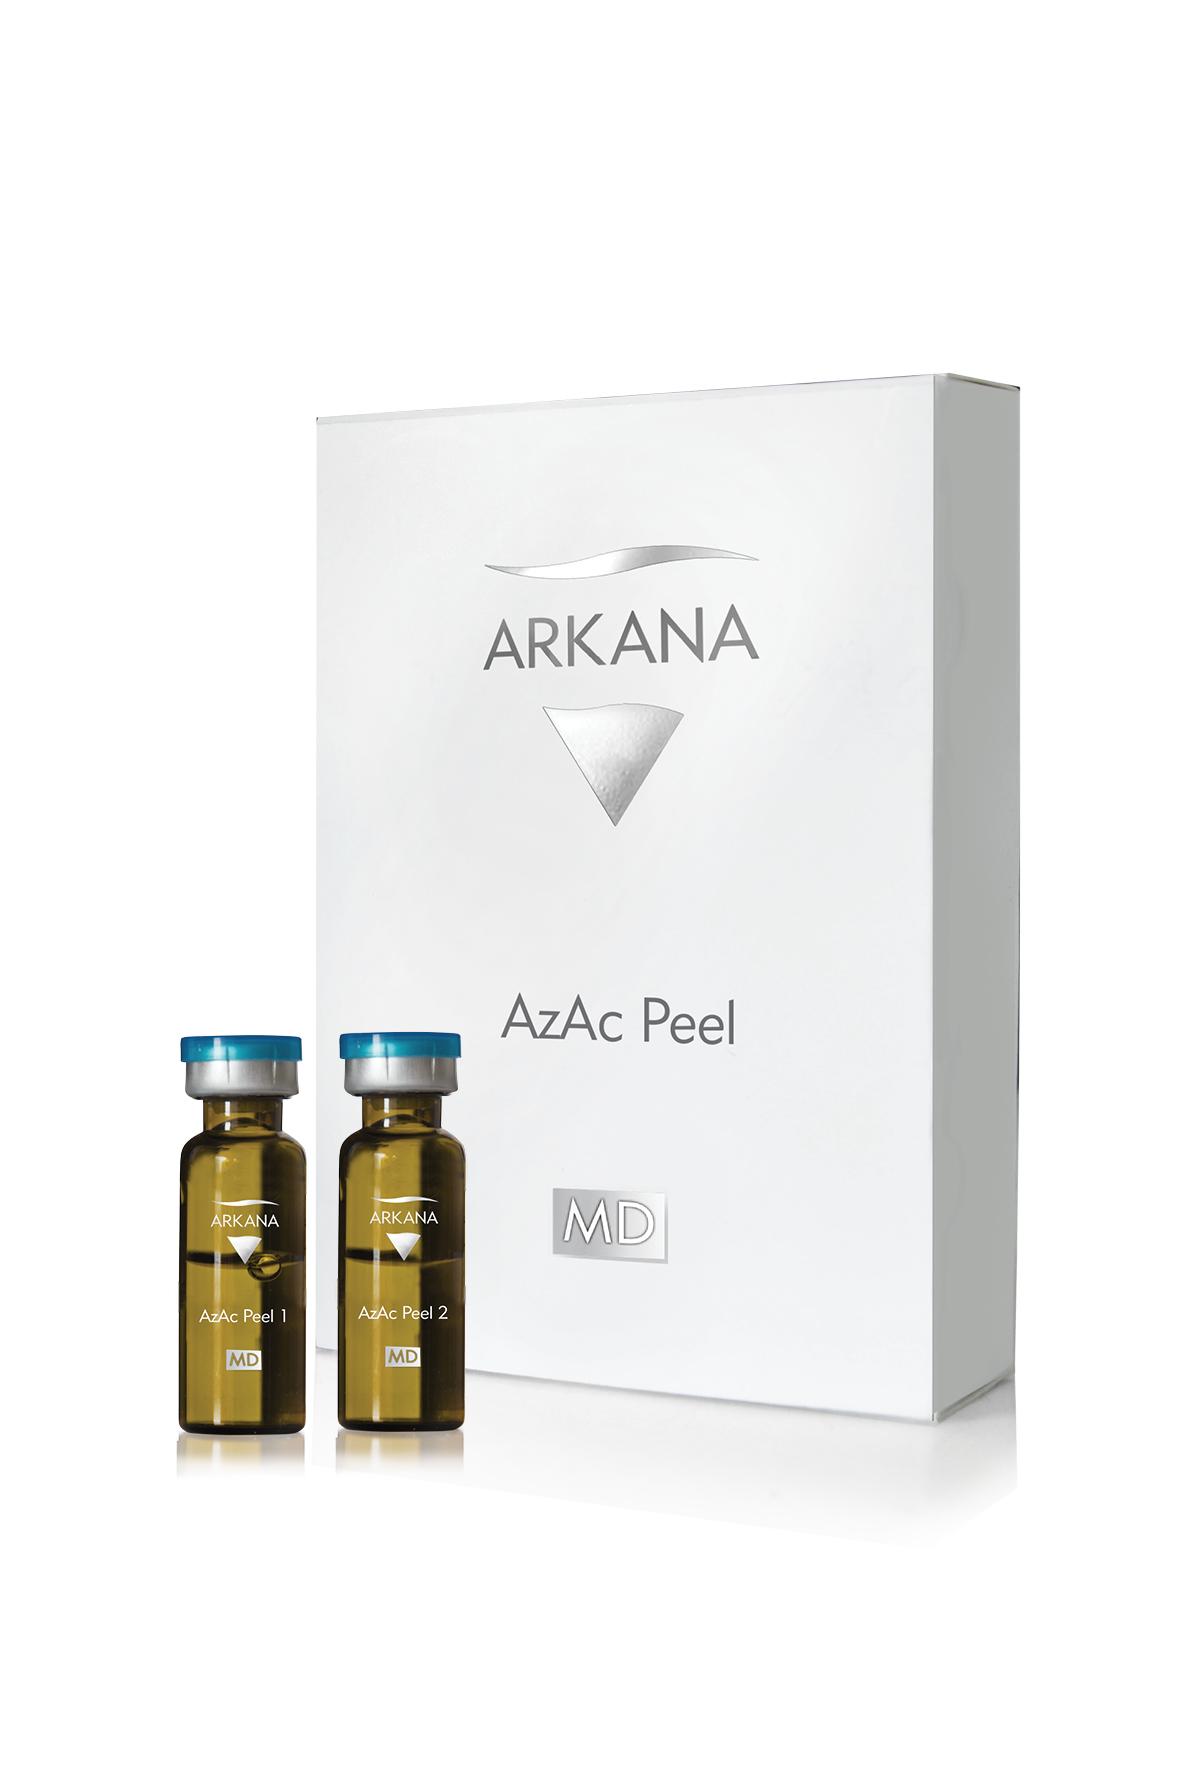 Azac Peel Arkana